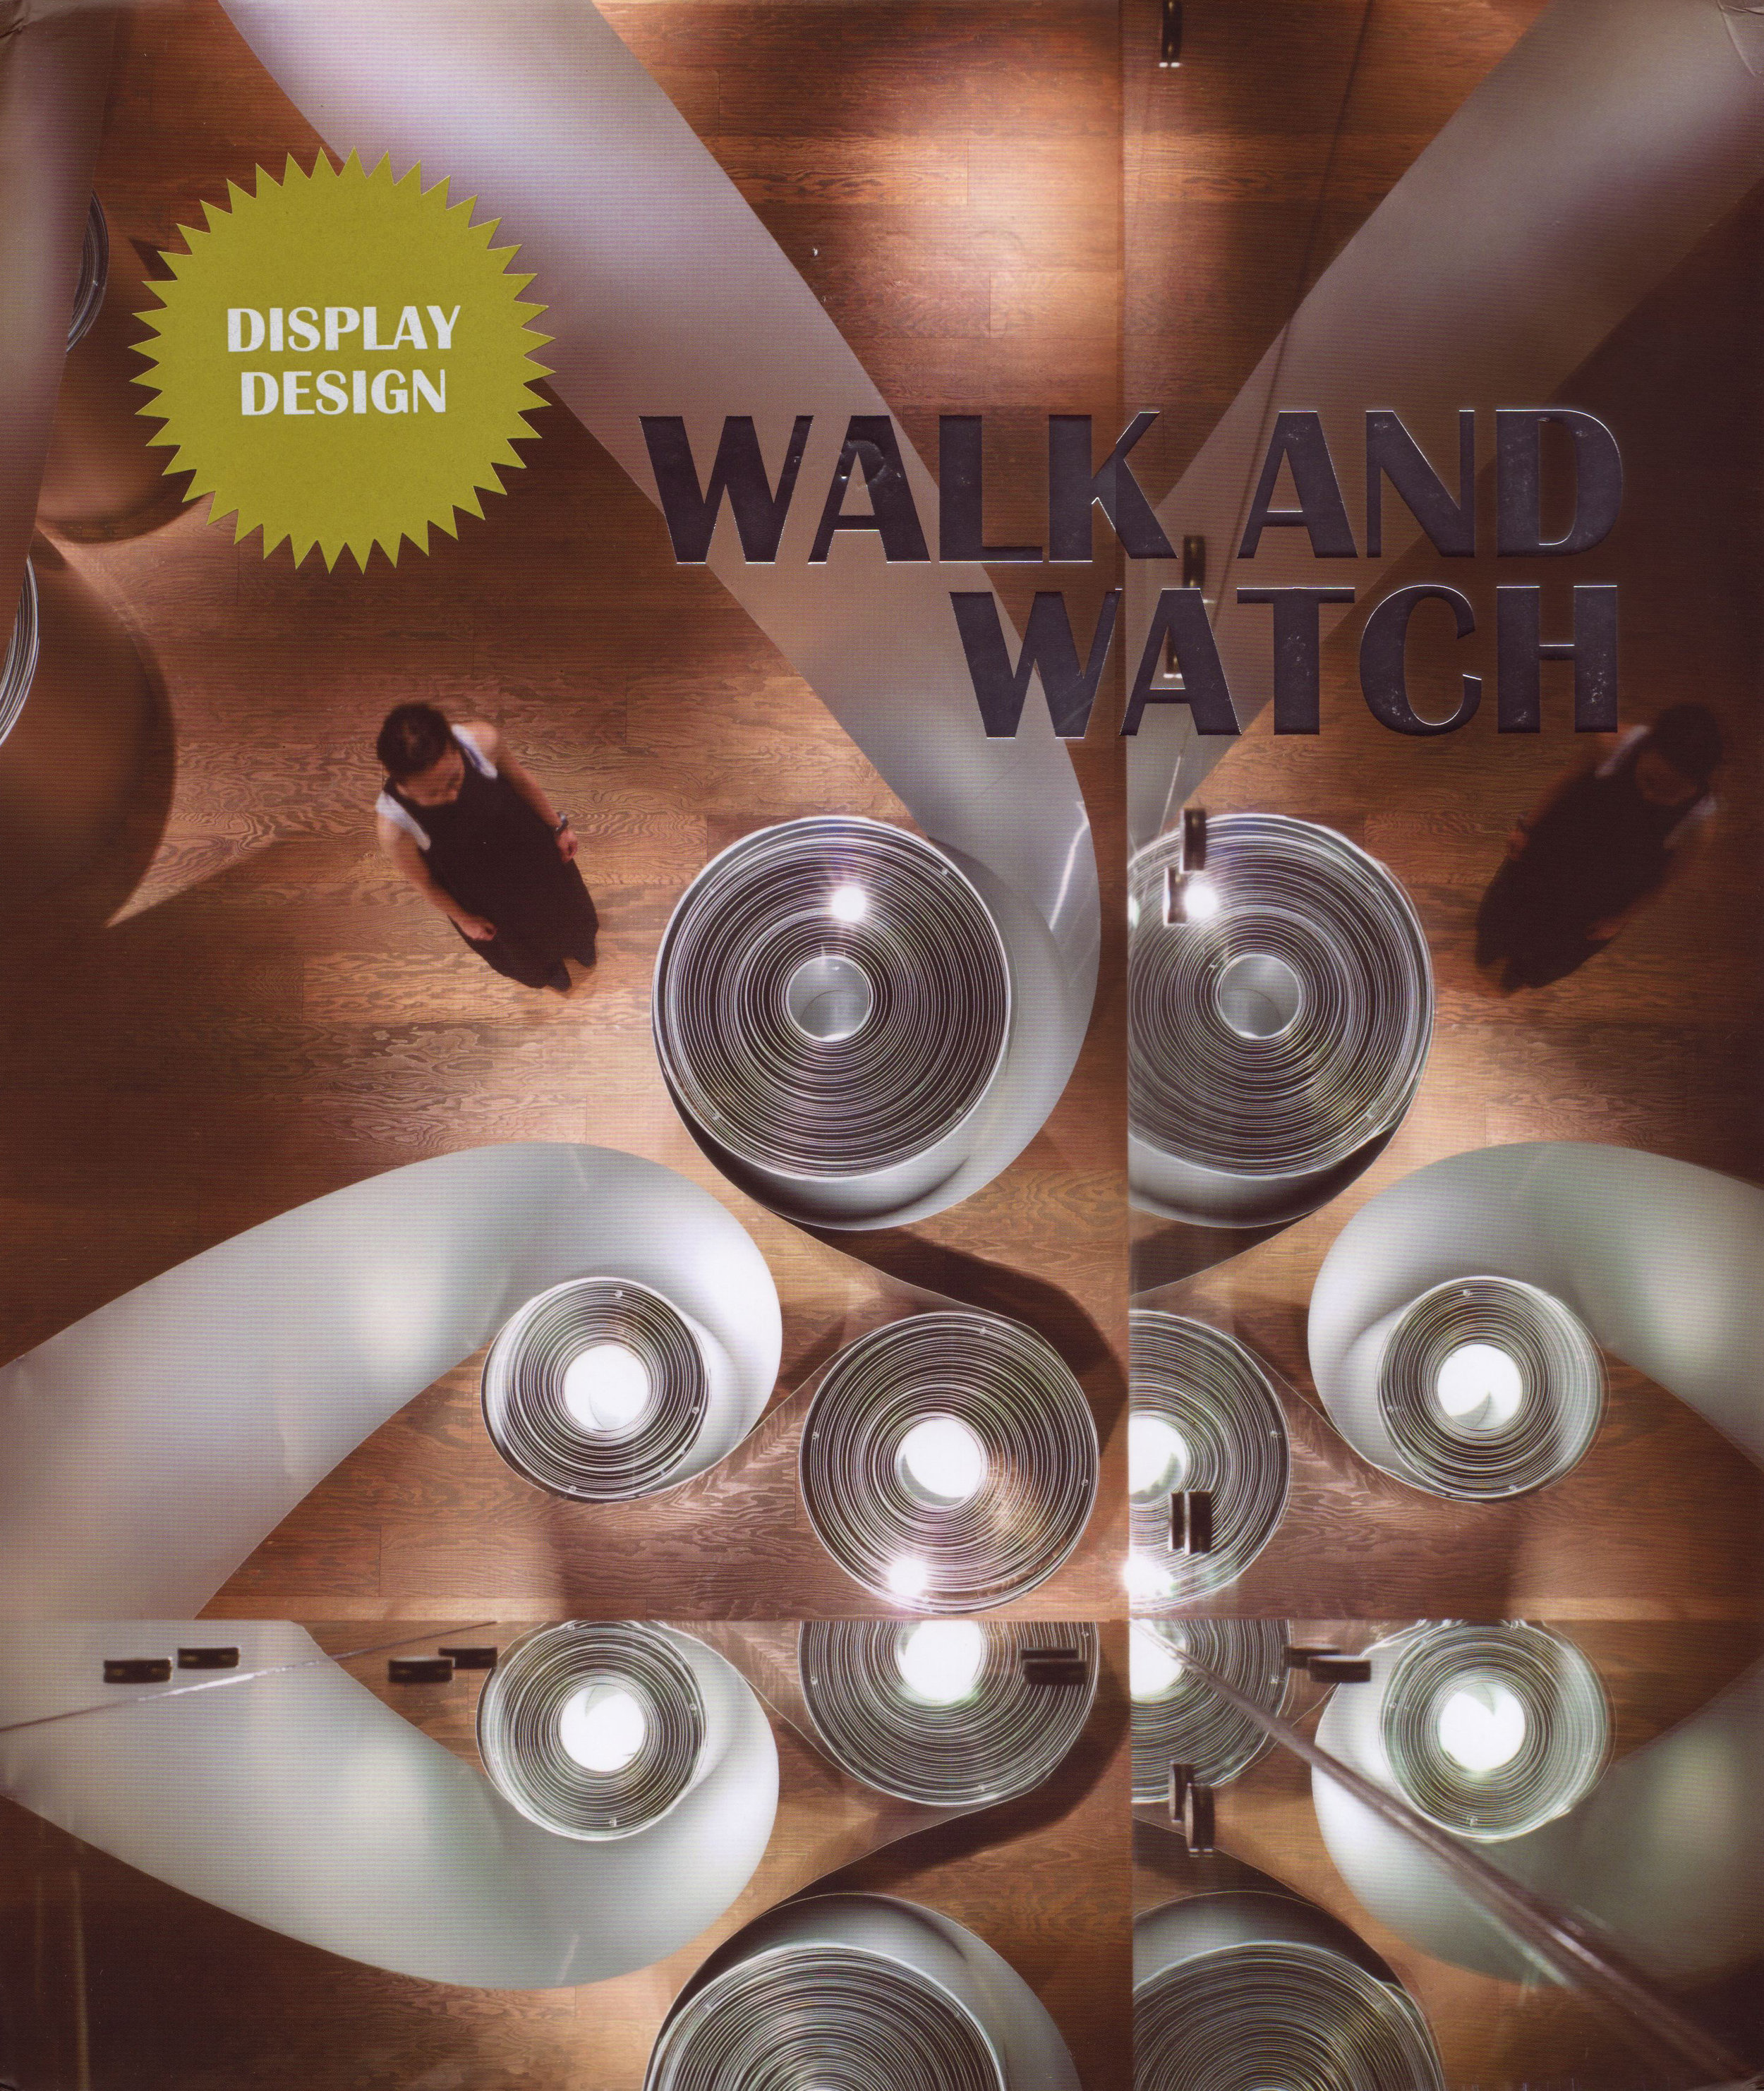 Walk and Watch Book - Artpower Publishing